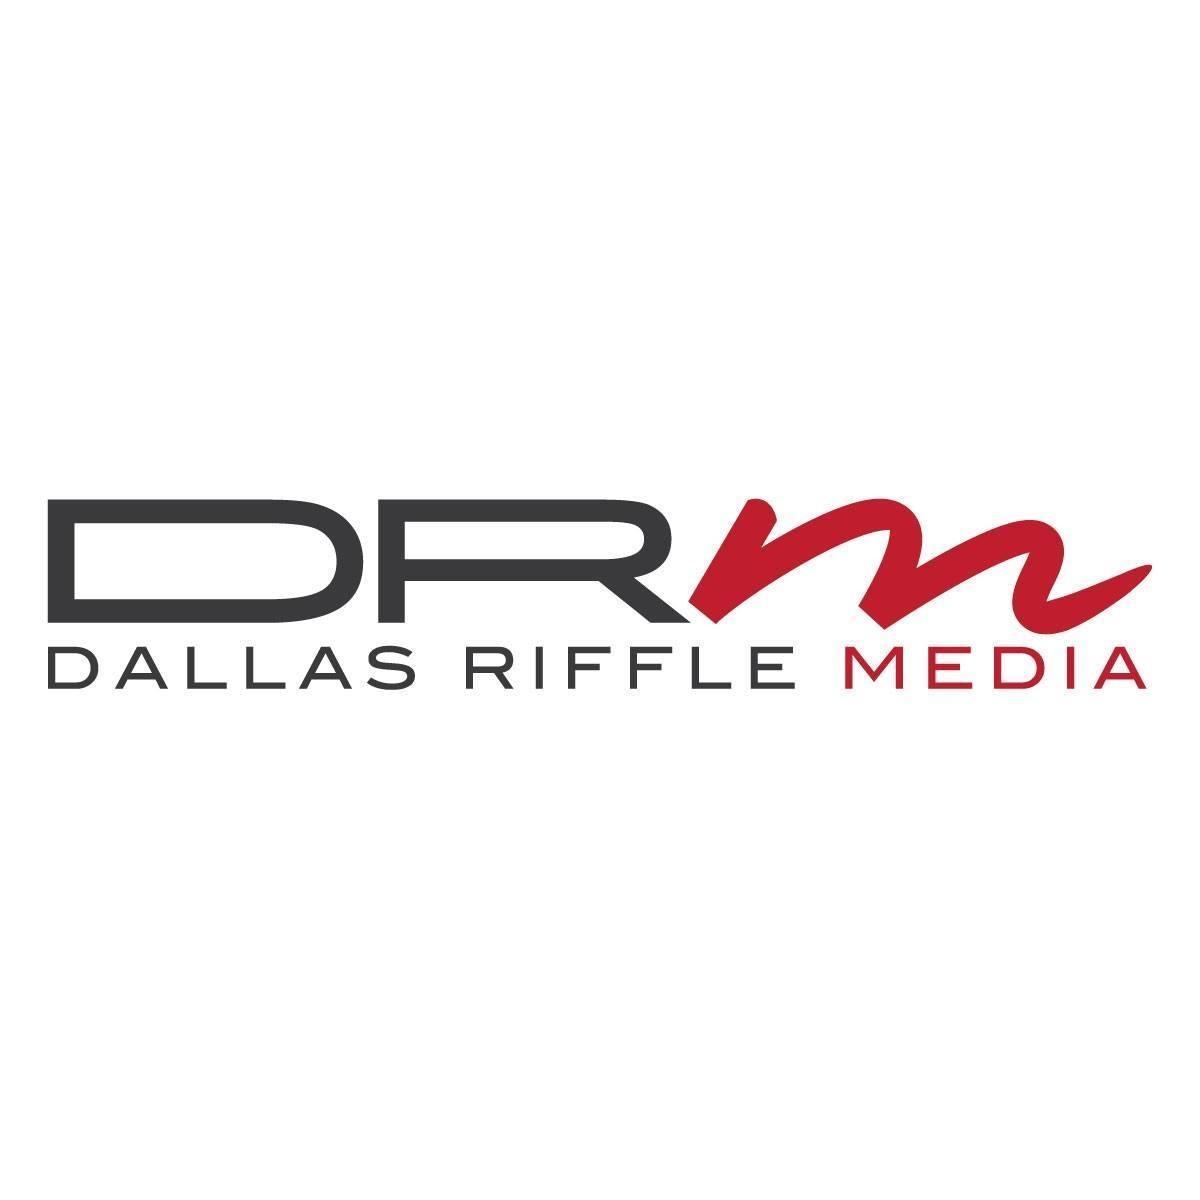 Dallas Riffle Media